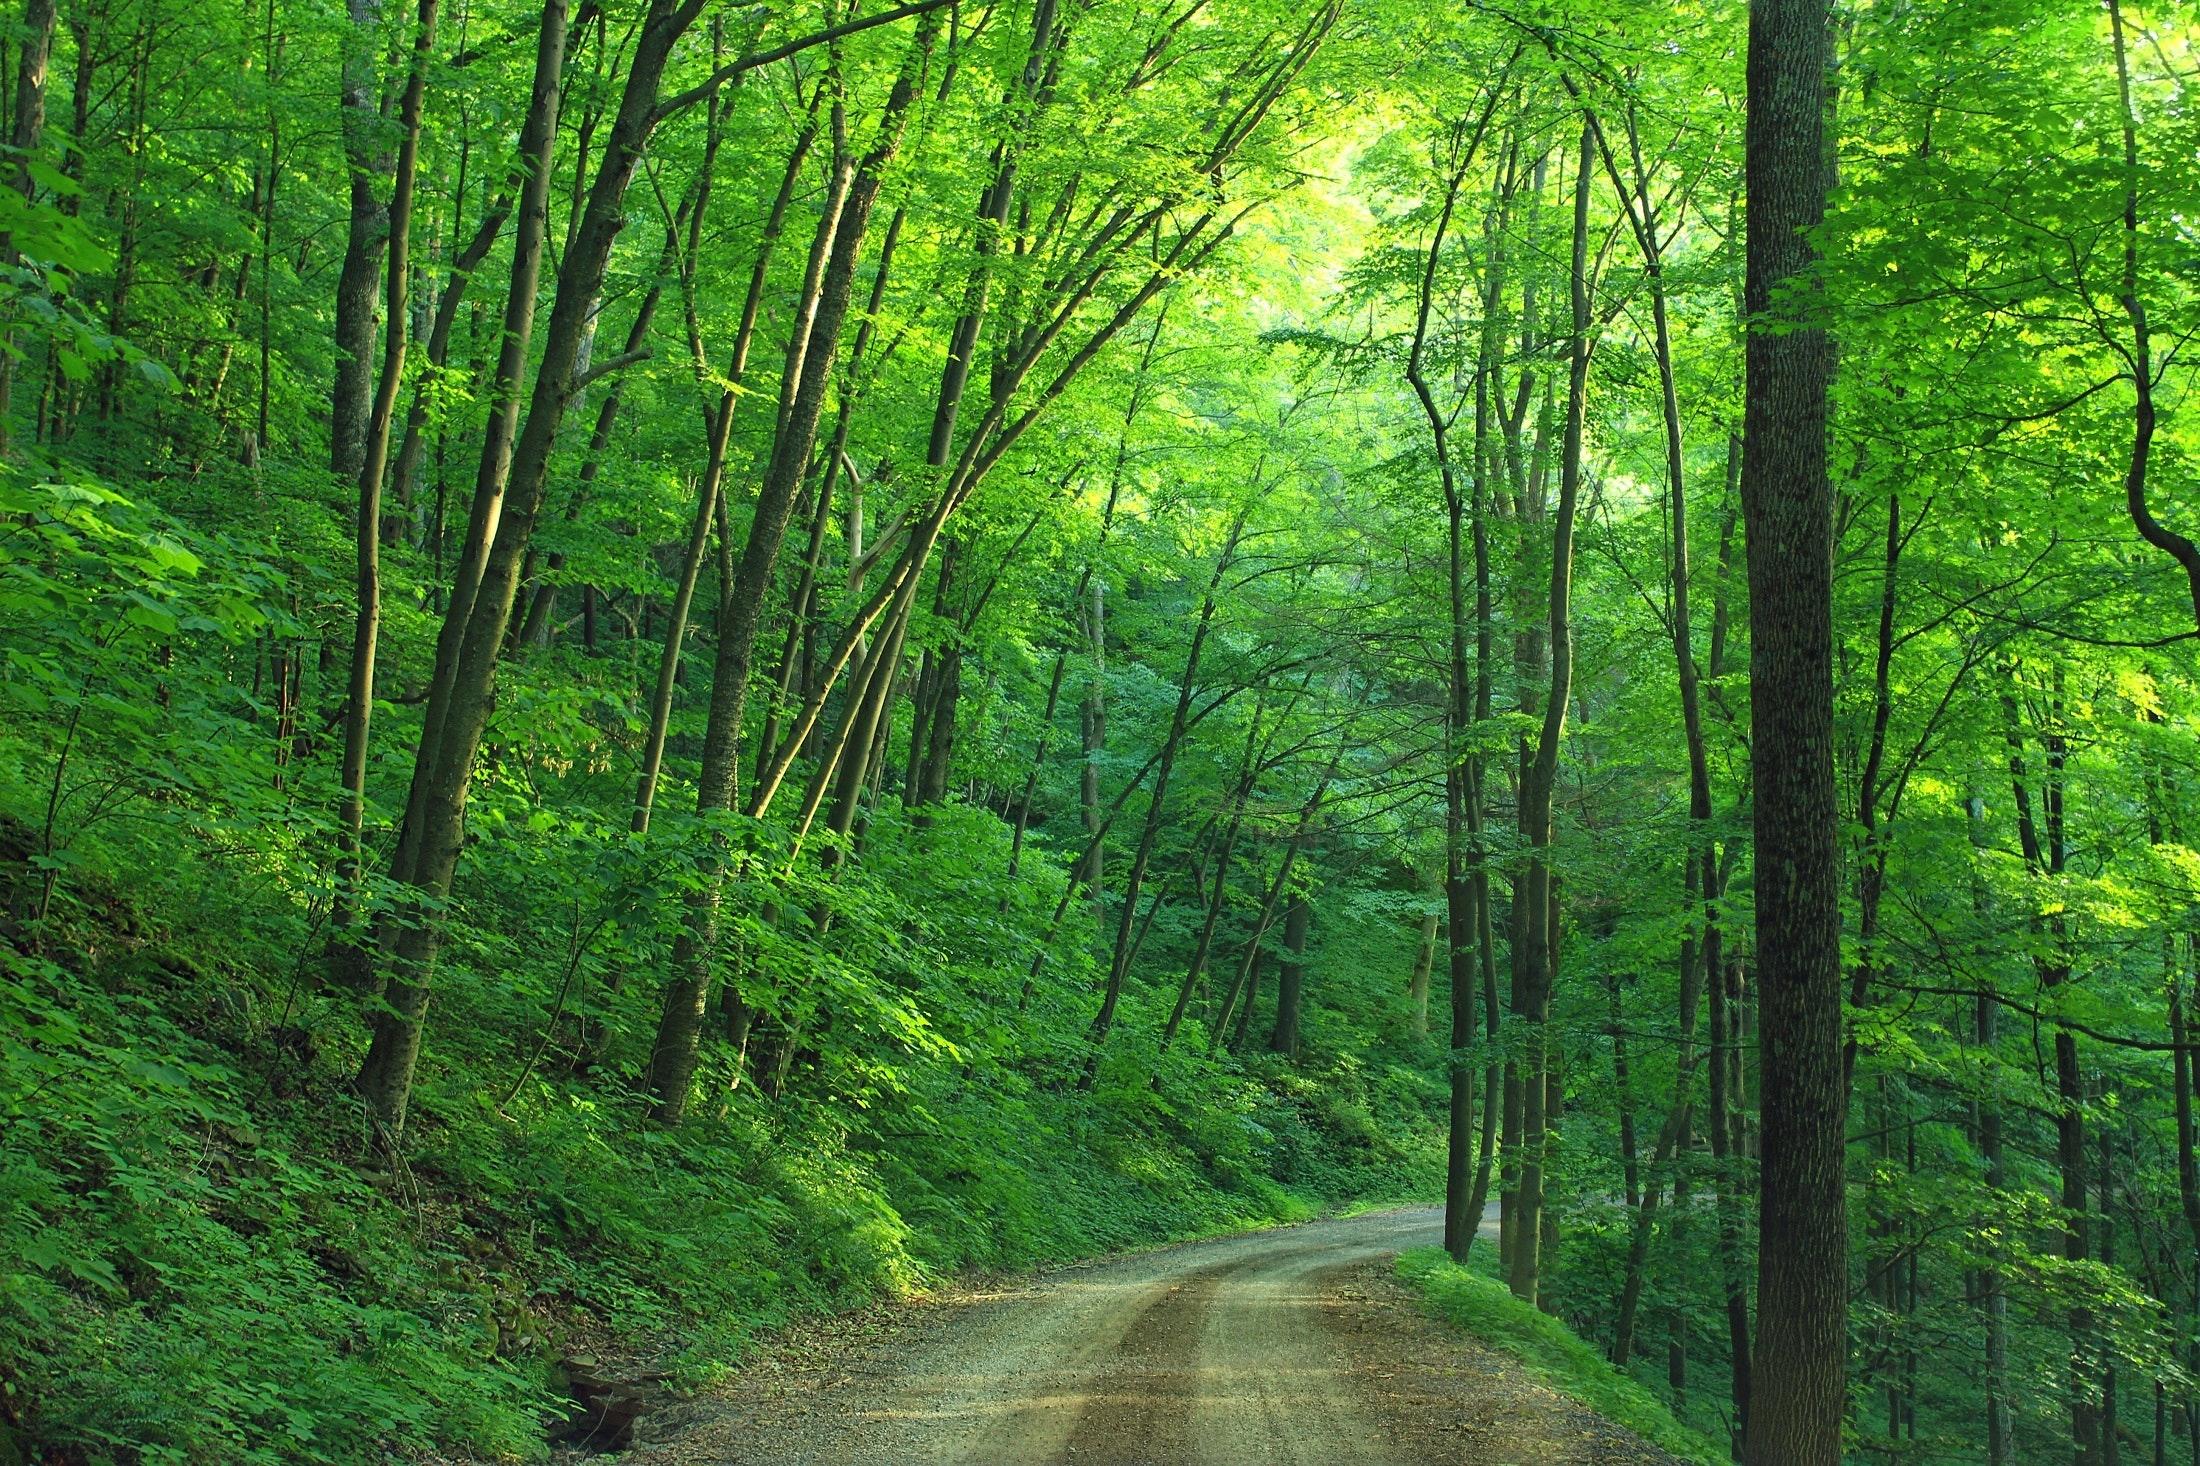 Green tree beside roadway during daytime photo